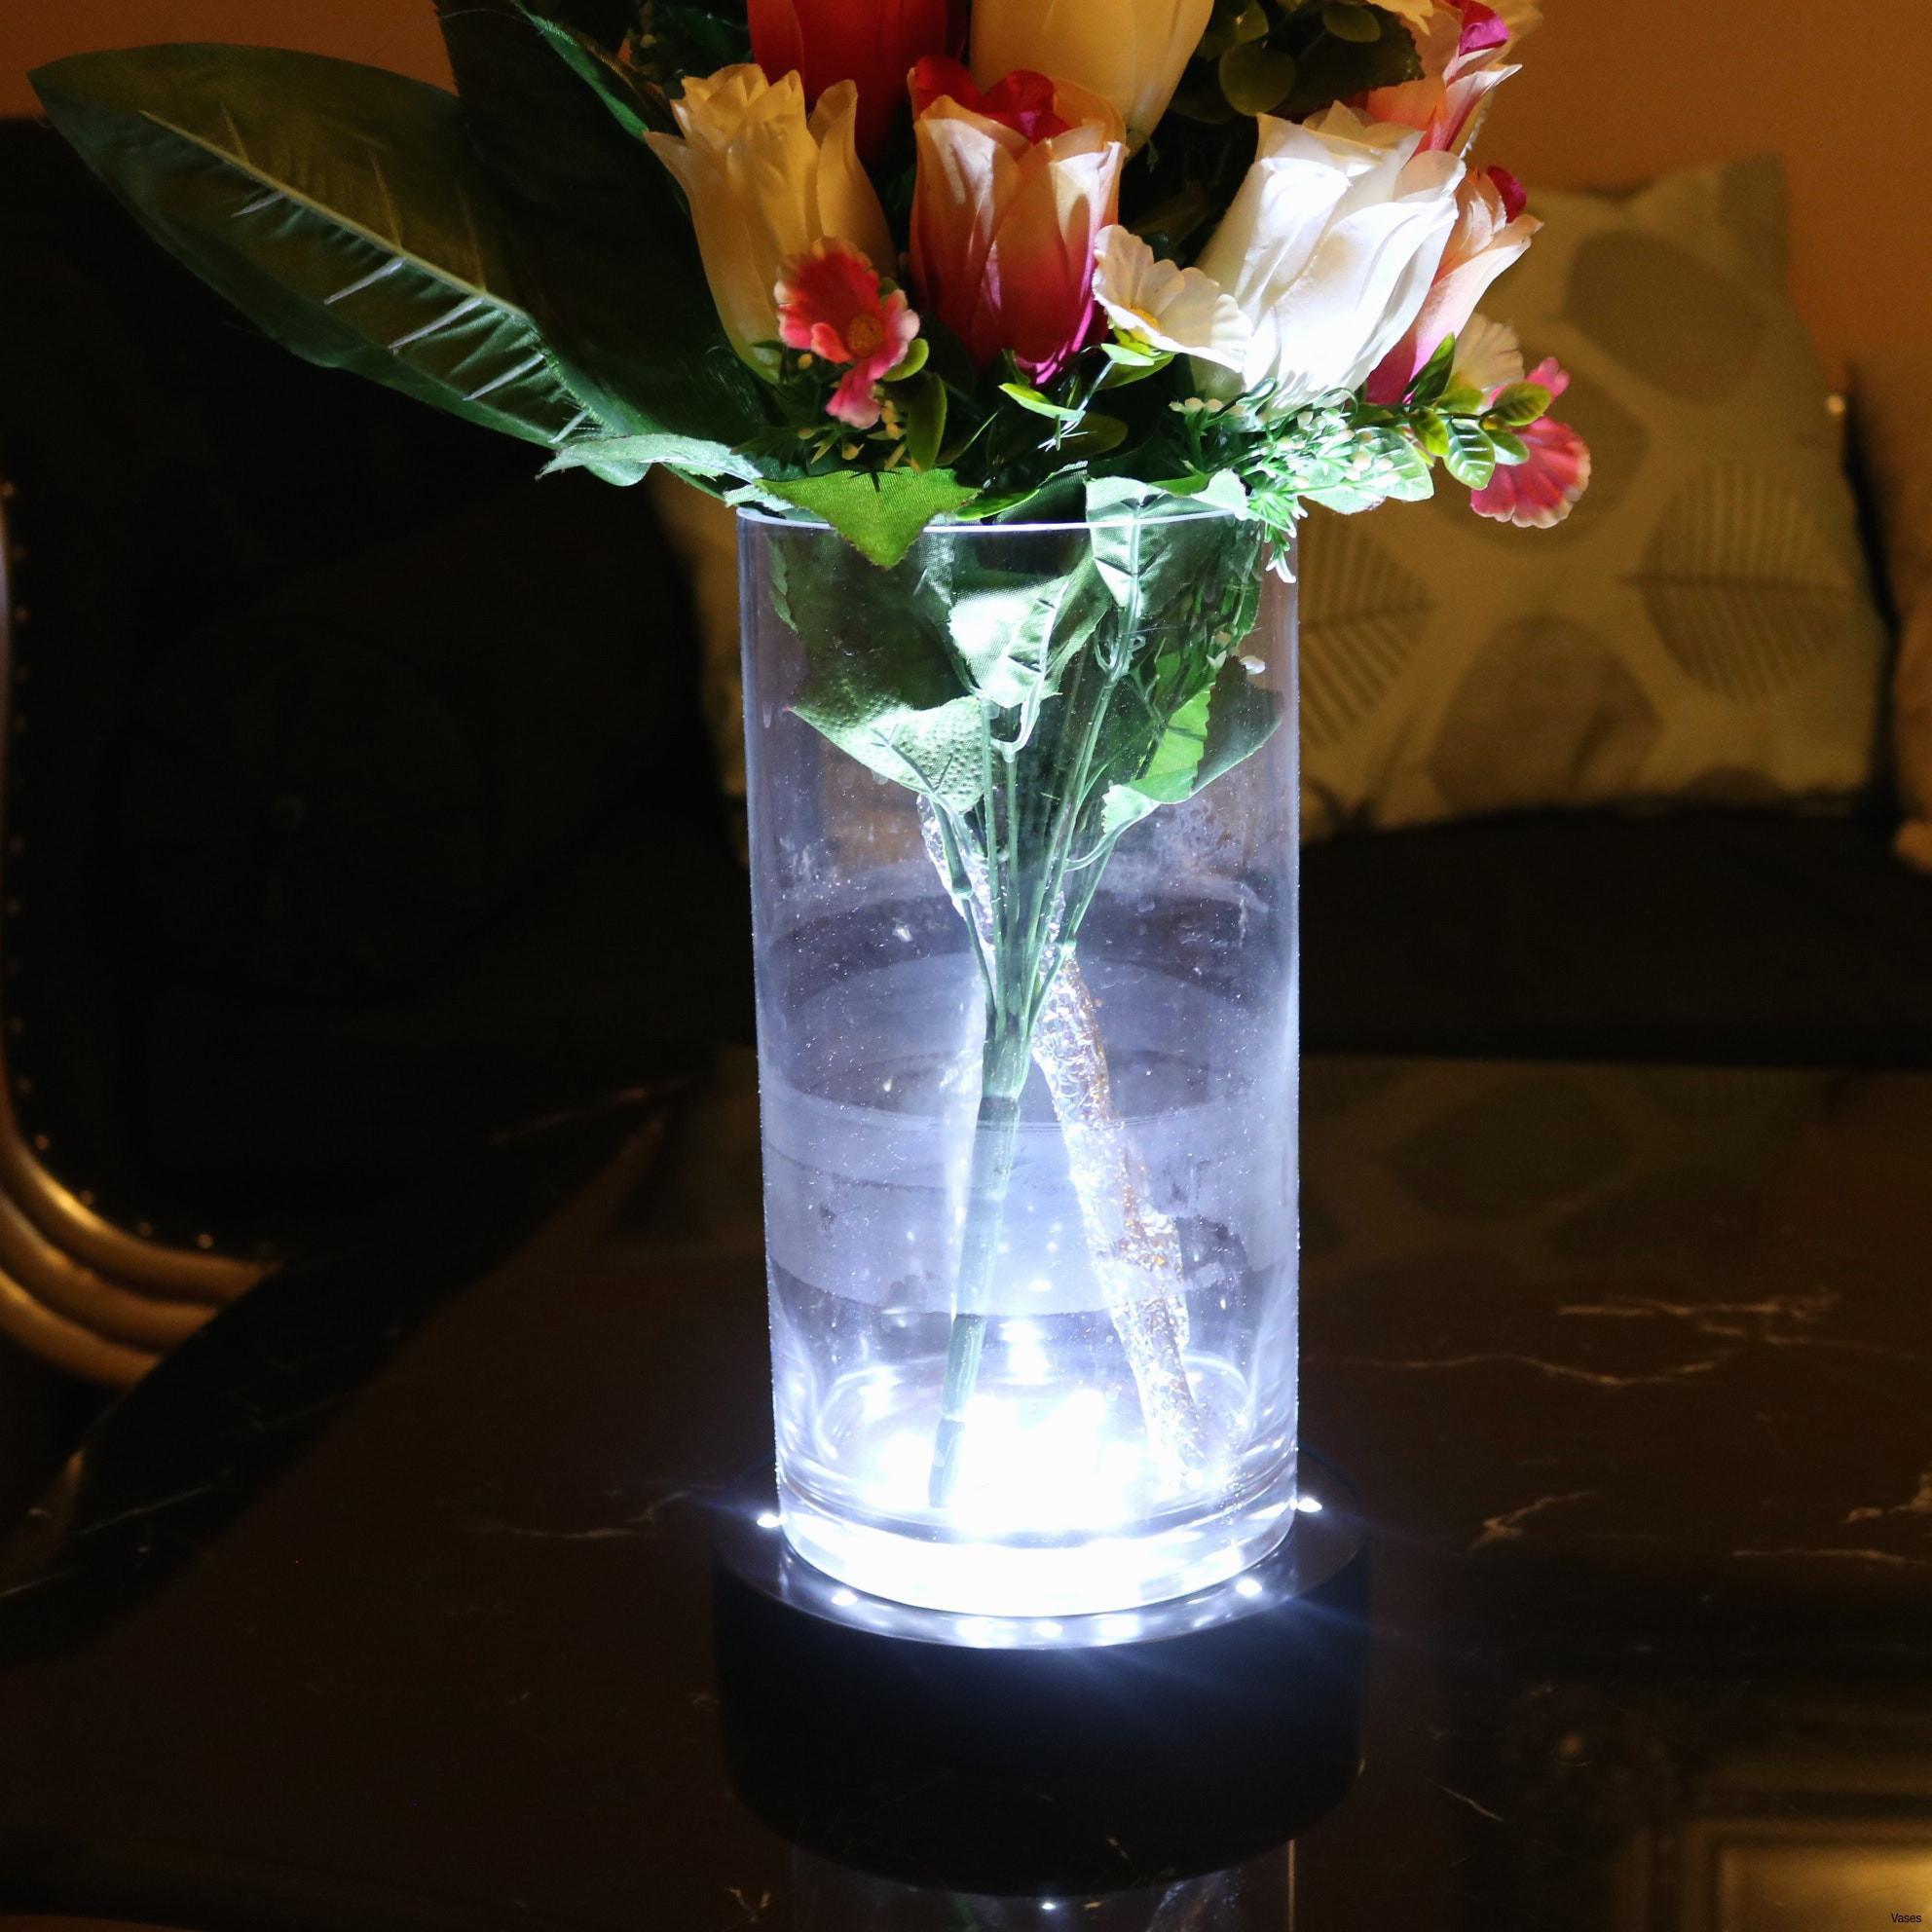 blush pink flowers in vase of 7 elegant wedding bouquet holder for silk flowers pics best roses within inspirational vases disposable plastic single cheap flower rose vasei 0d design of 7 el